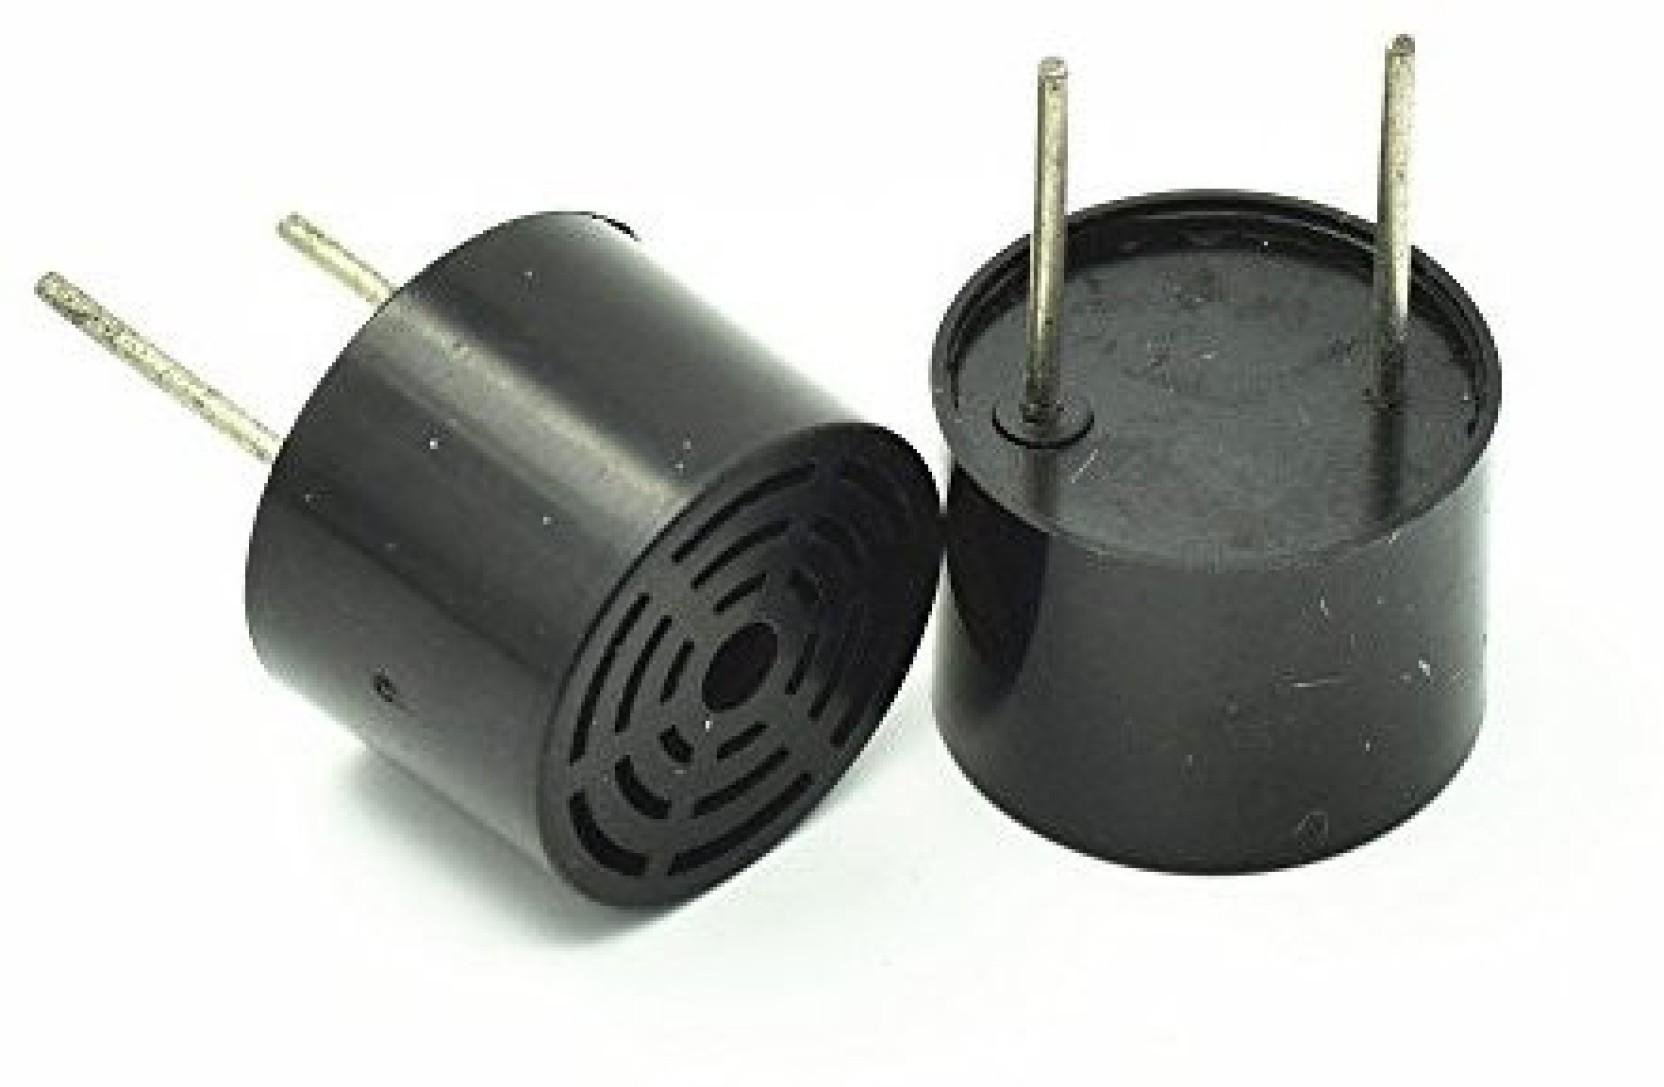 Generic Manorshi Electronics Component Plastic 16mm 40khz Ultrasonic Transmitter Circuit Sensor 100pcs On Offer